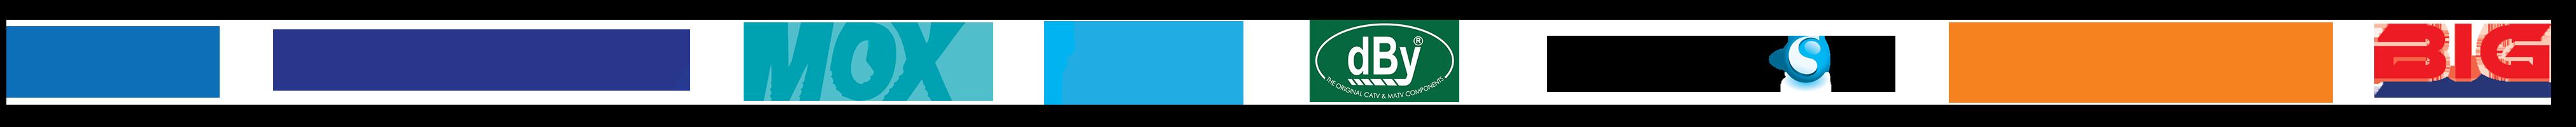 logo-8-band